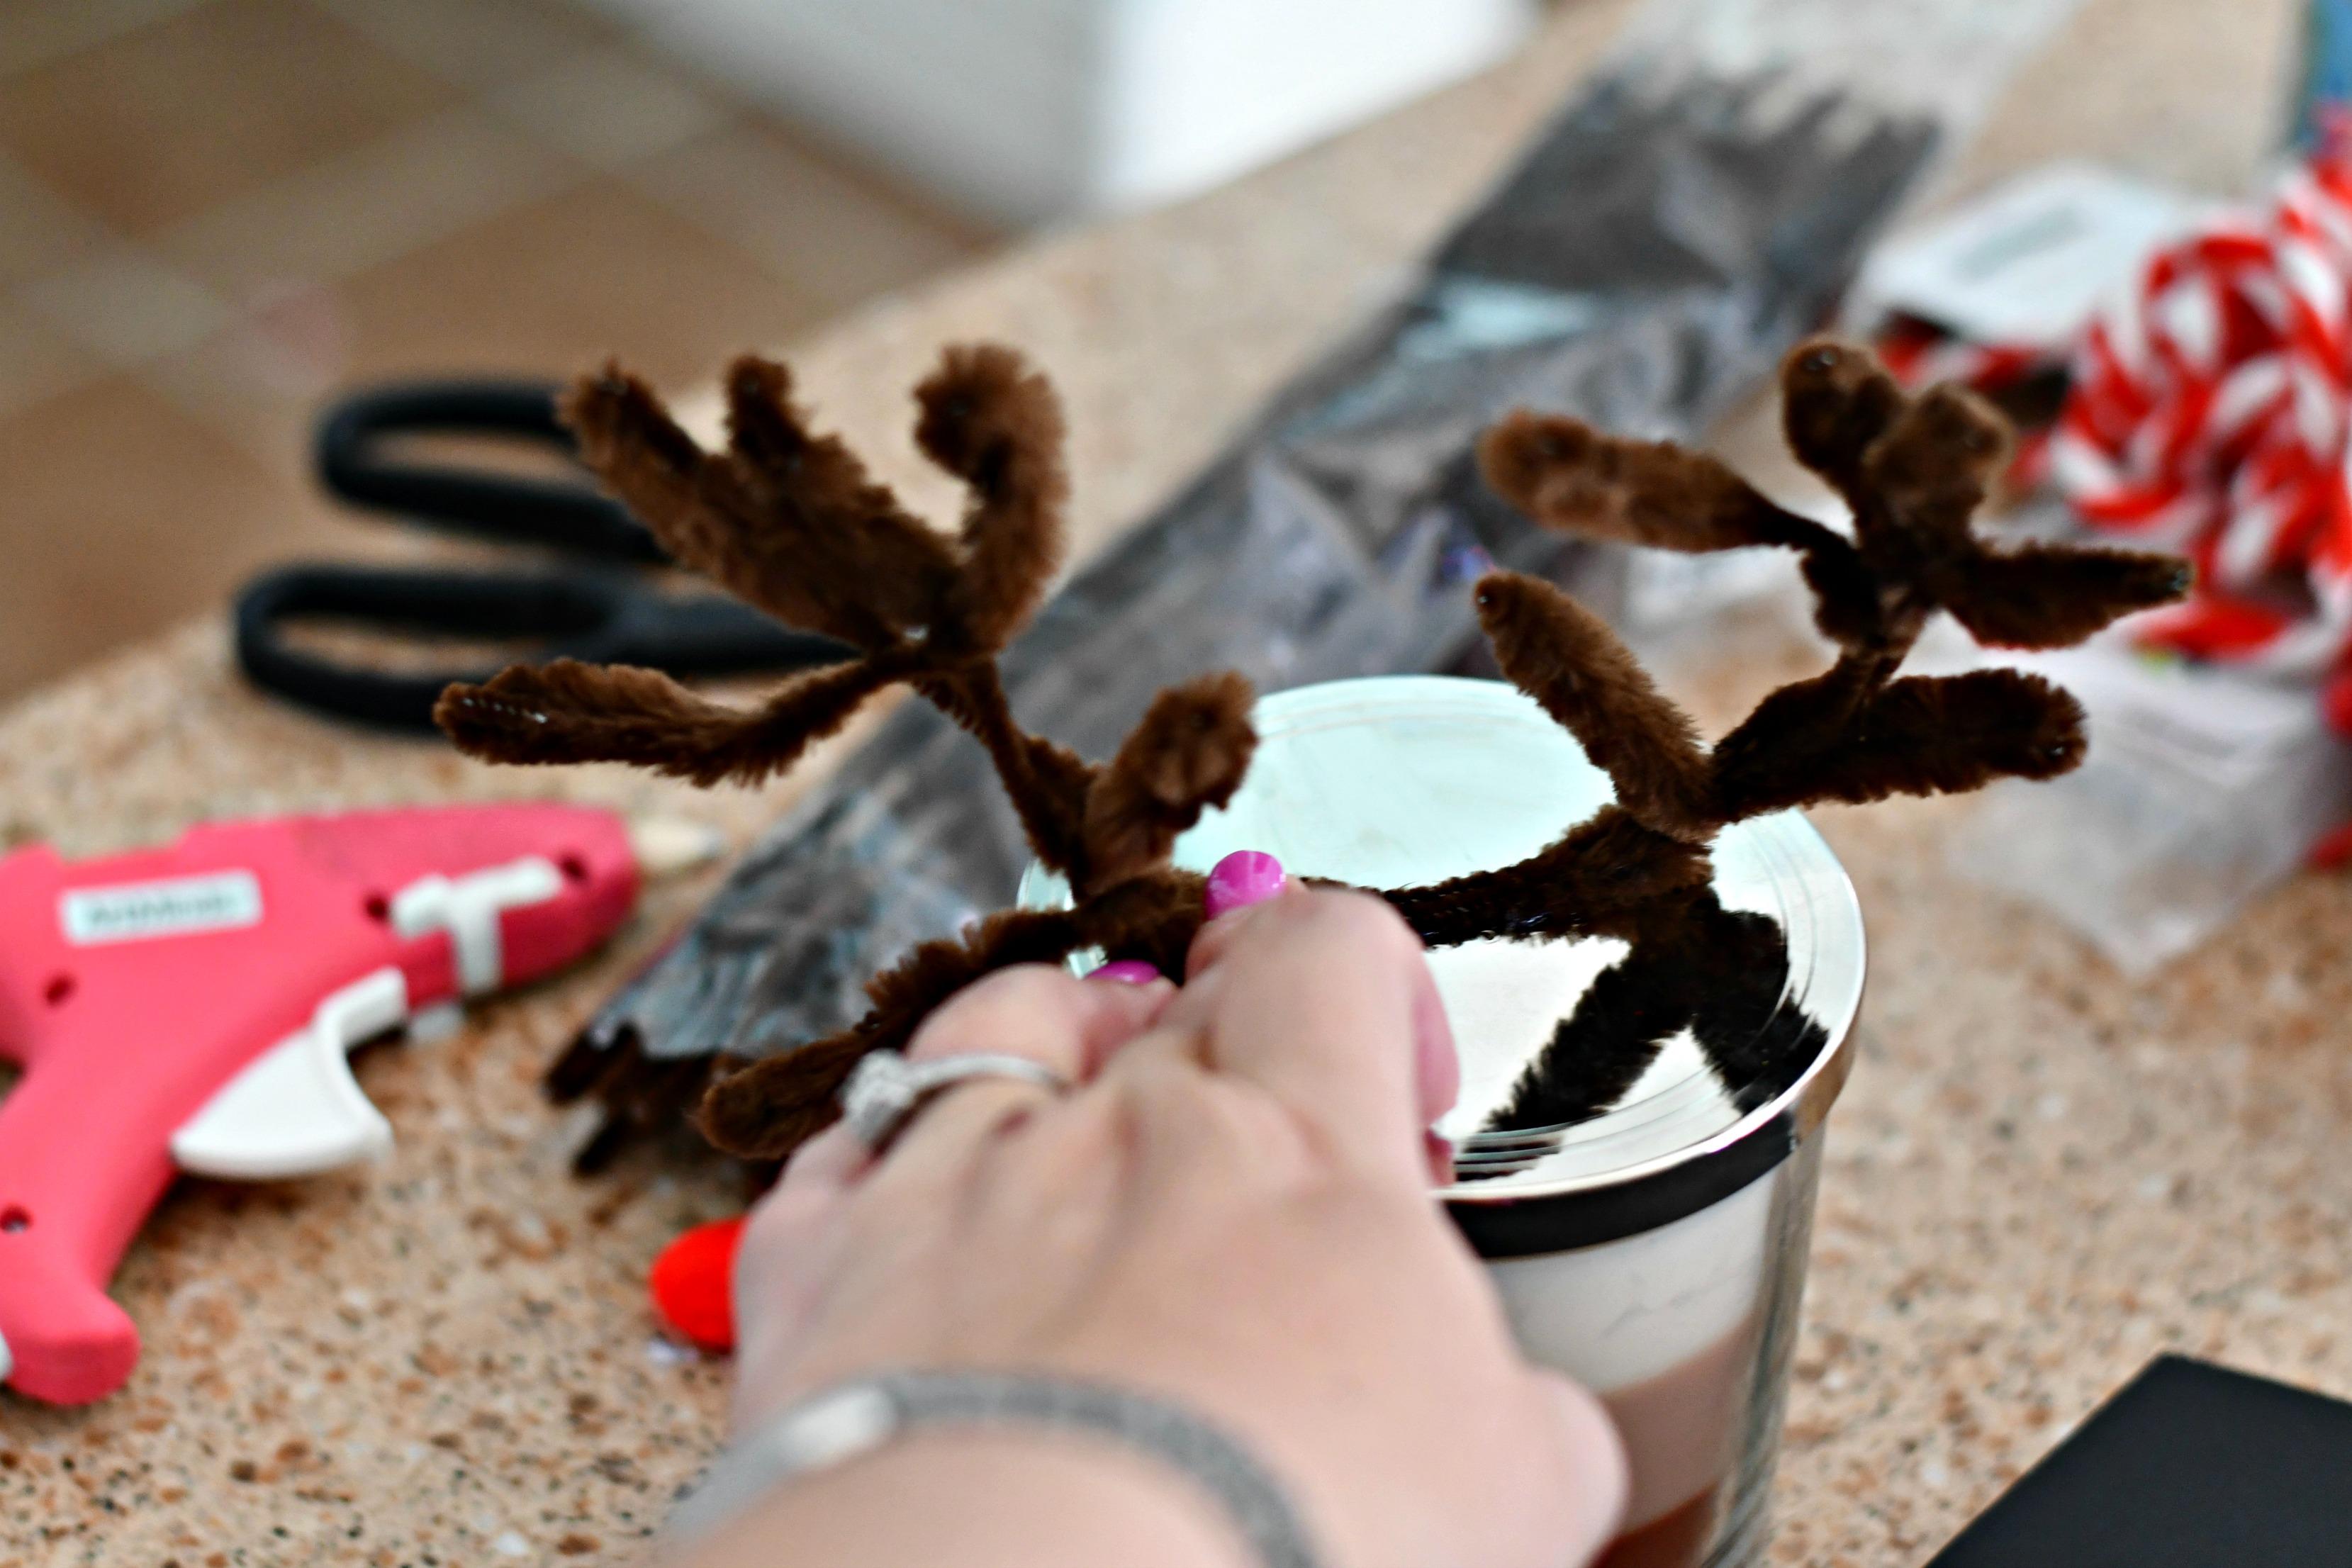 easy diy christmas candle gift ideas – Adding reindeer antlers